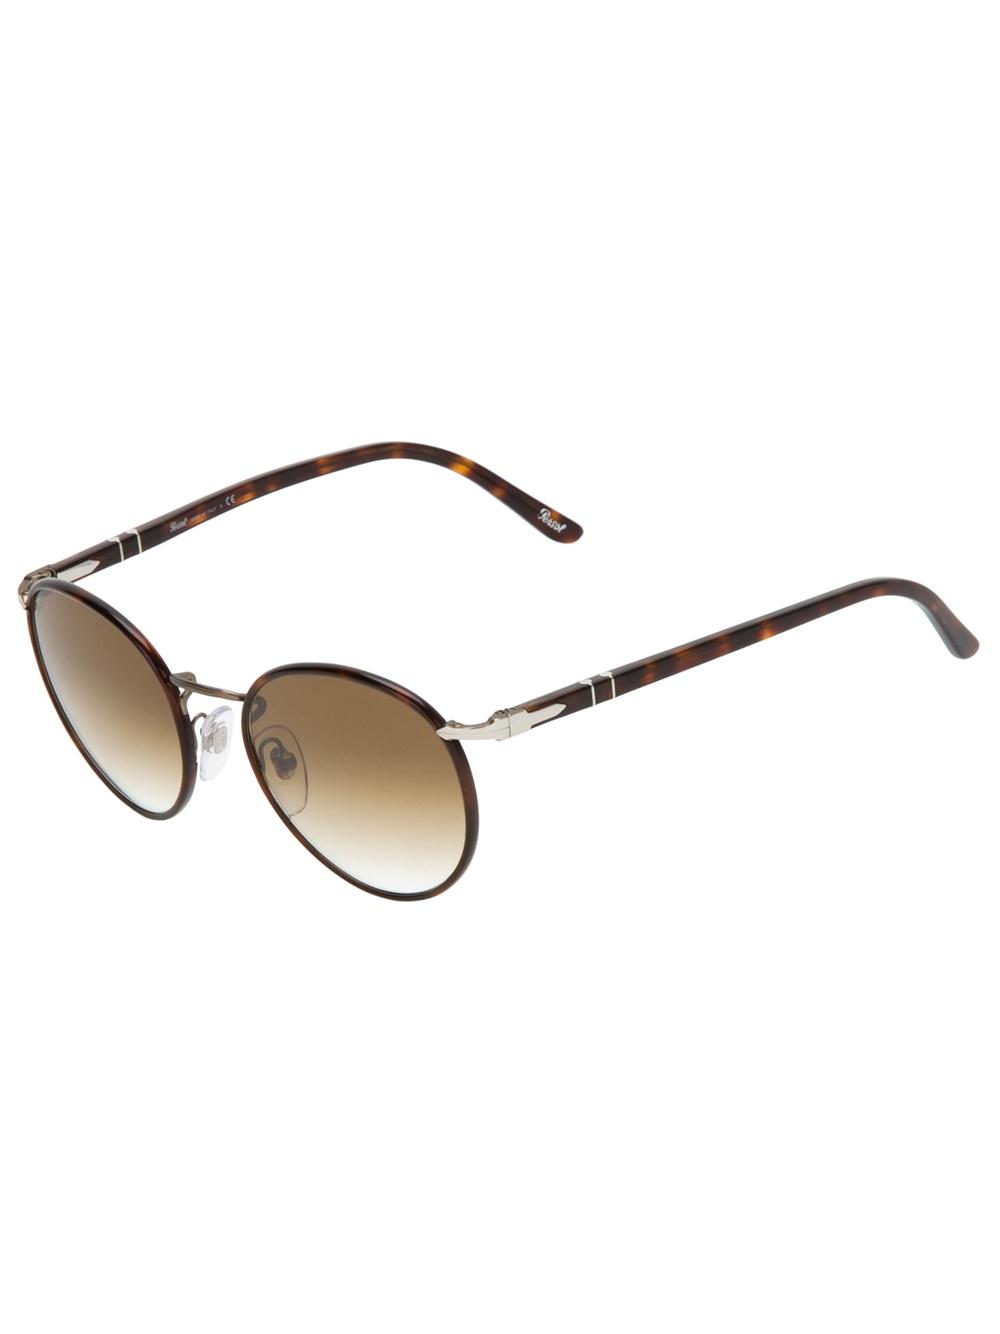 5f62c61a05 Persol Round Sunglasses in Brown